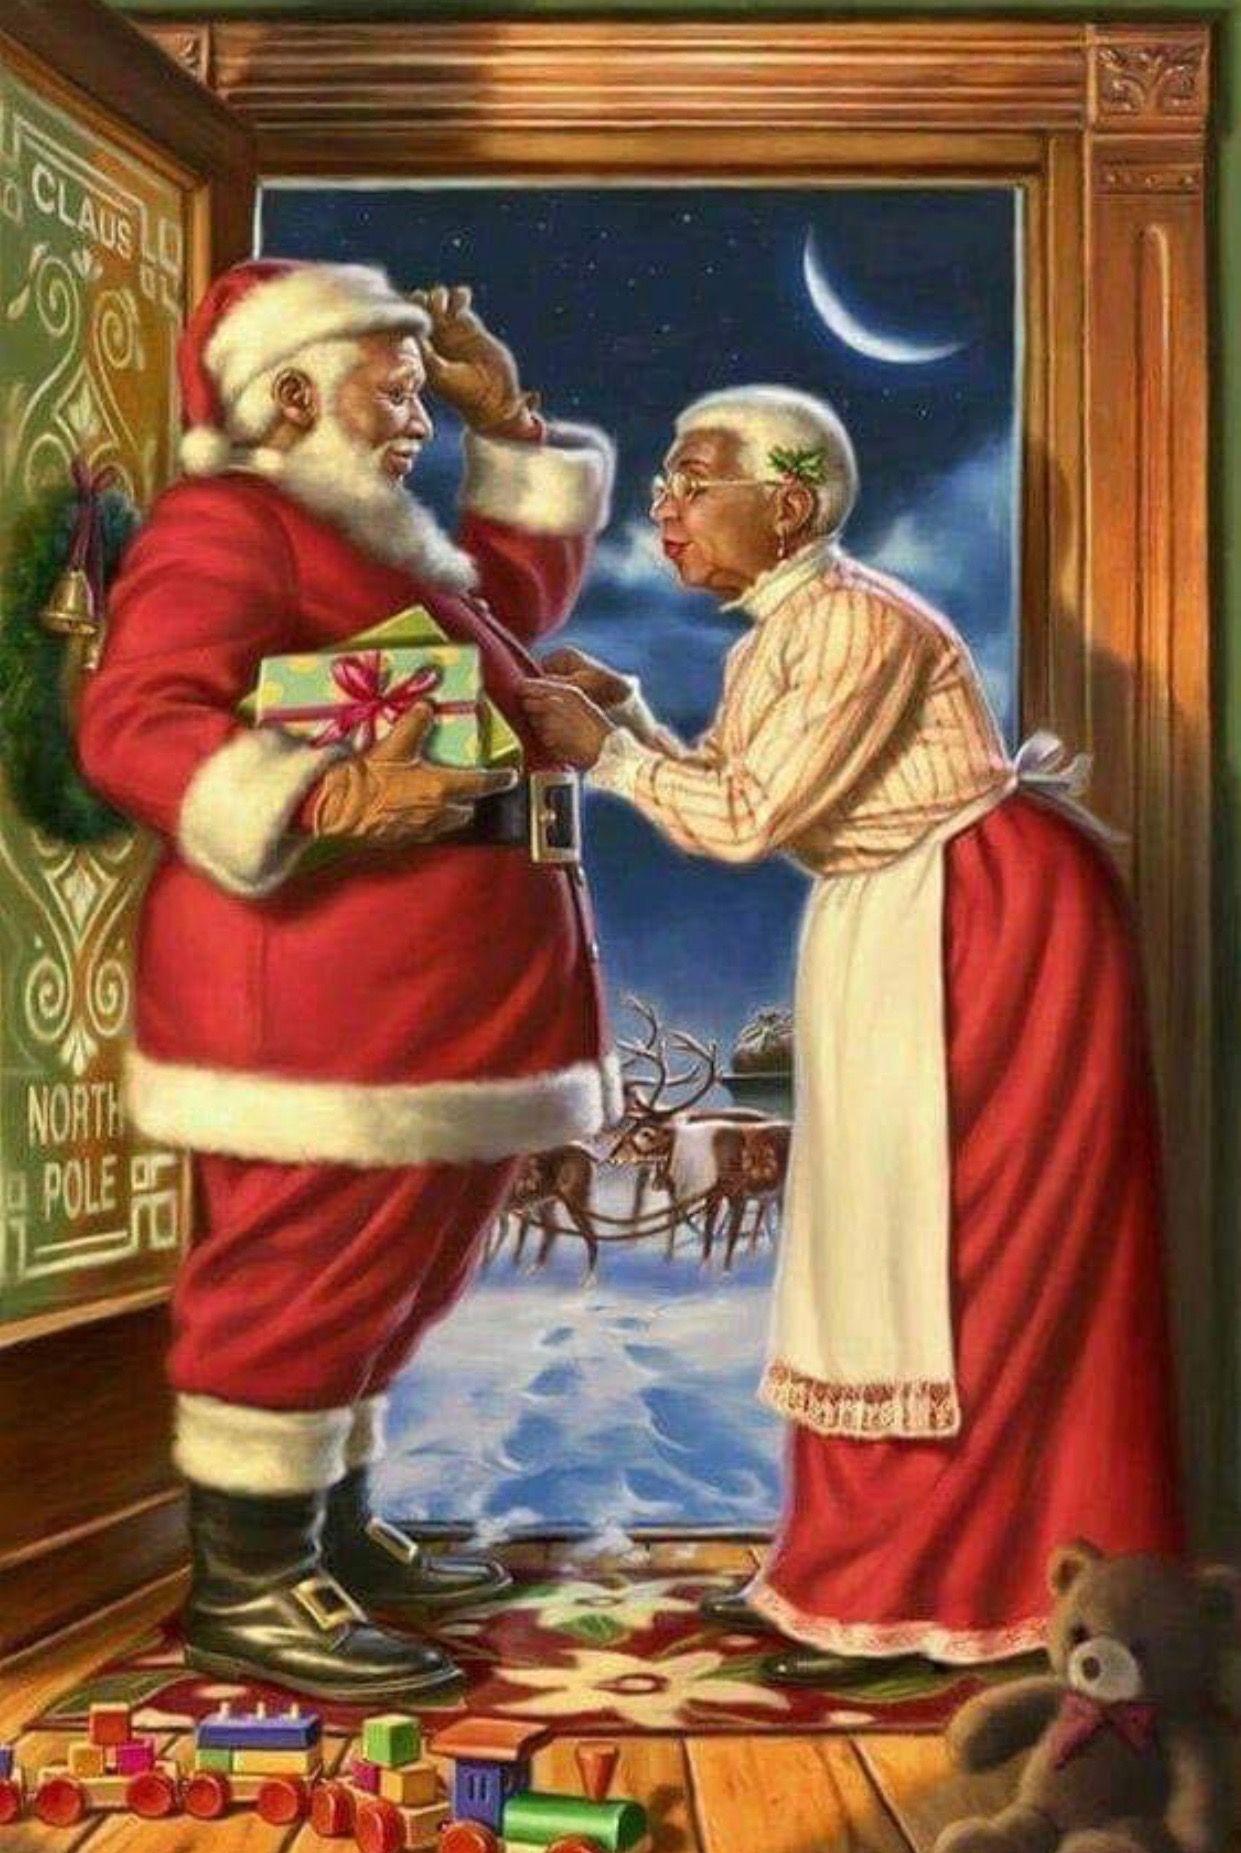 Pin By Edward Dahlem On Black Art Christmas Scenes Black Christmas American Greetings Cards